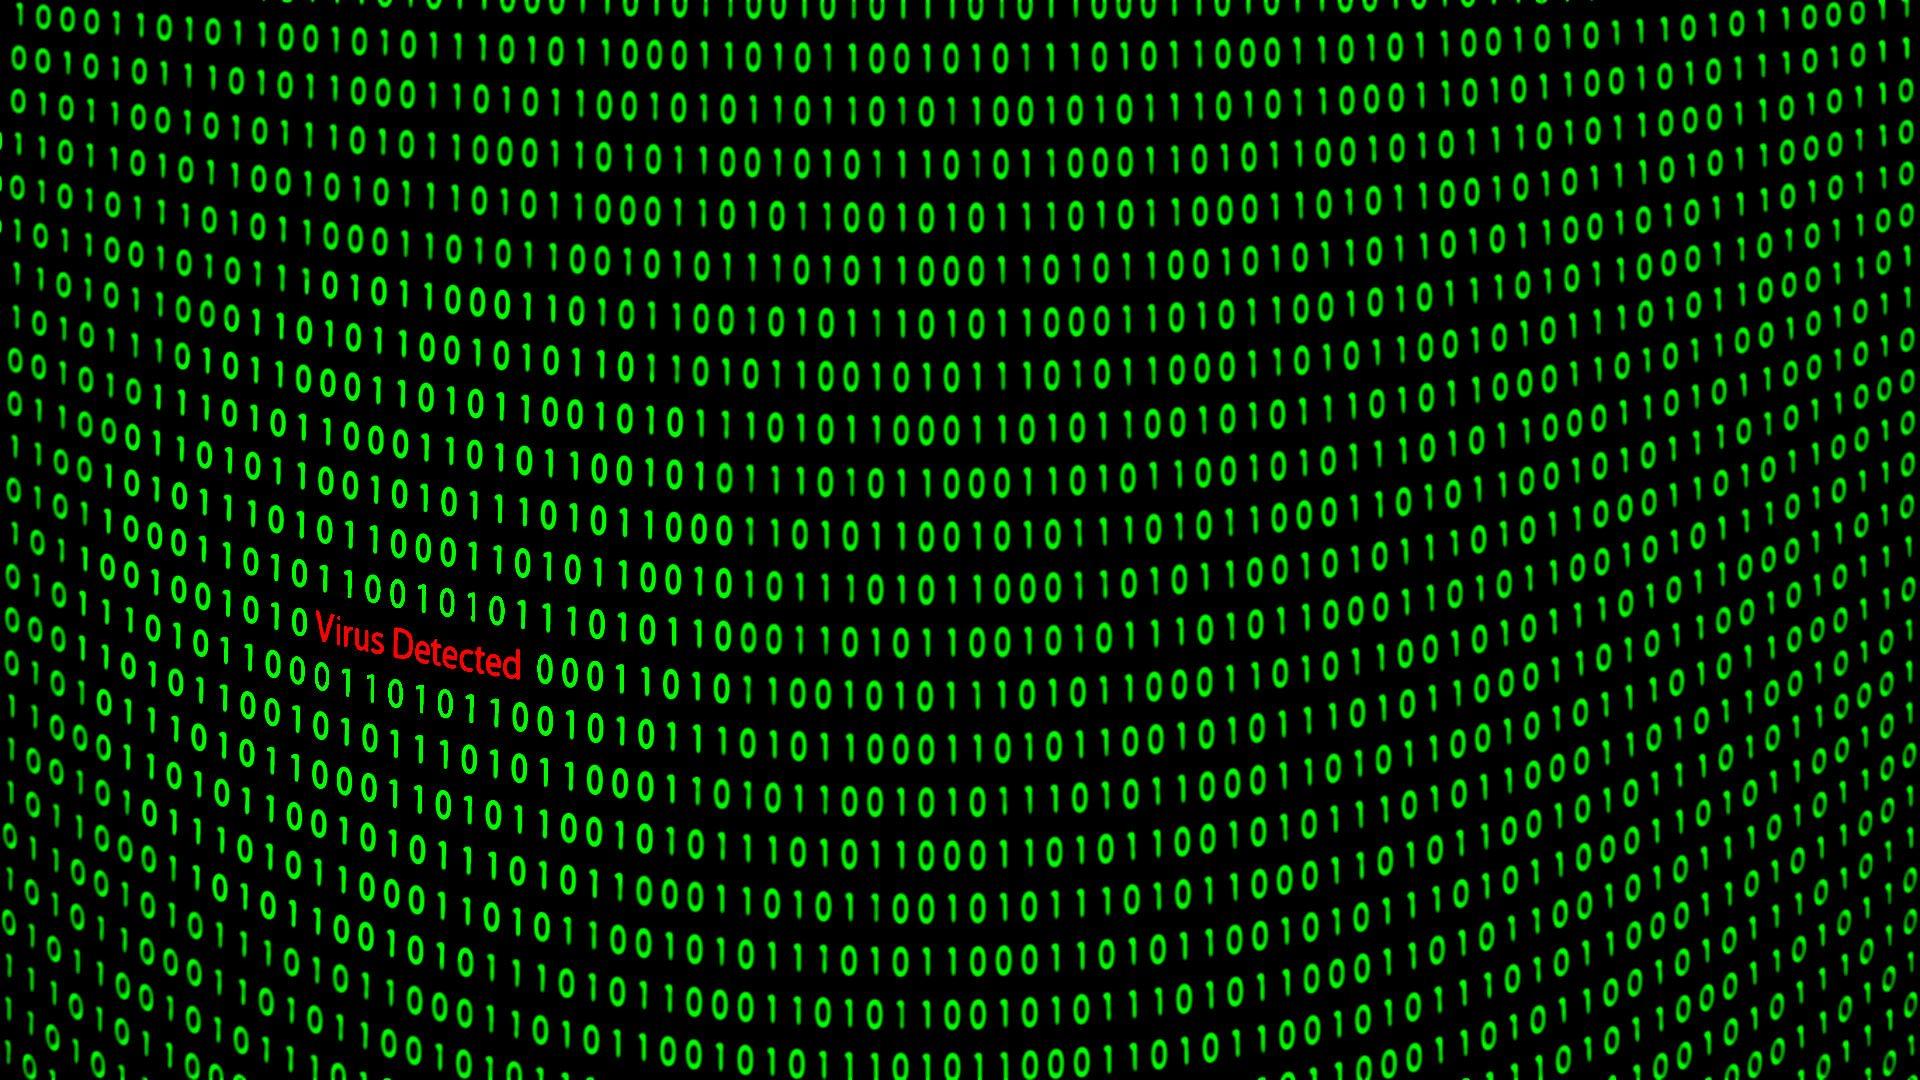 Hacker Backgrounds - WallpaperSafari